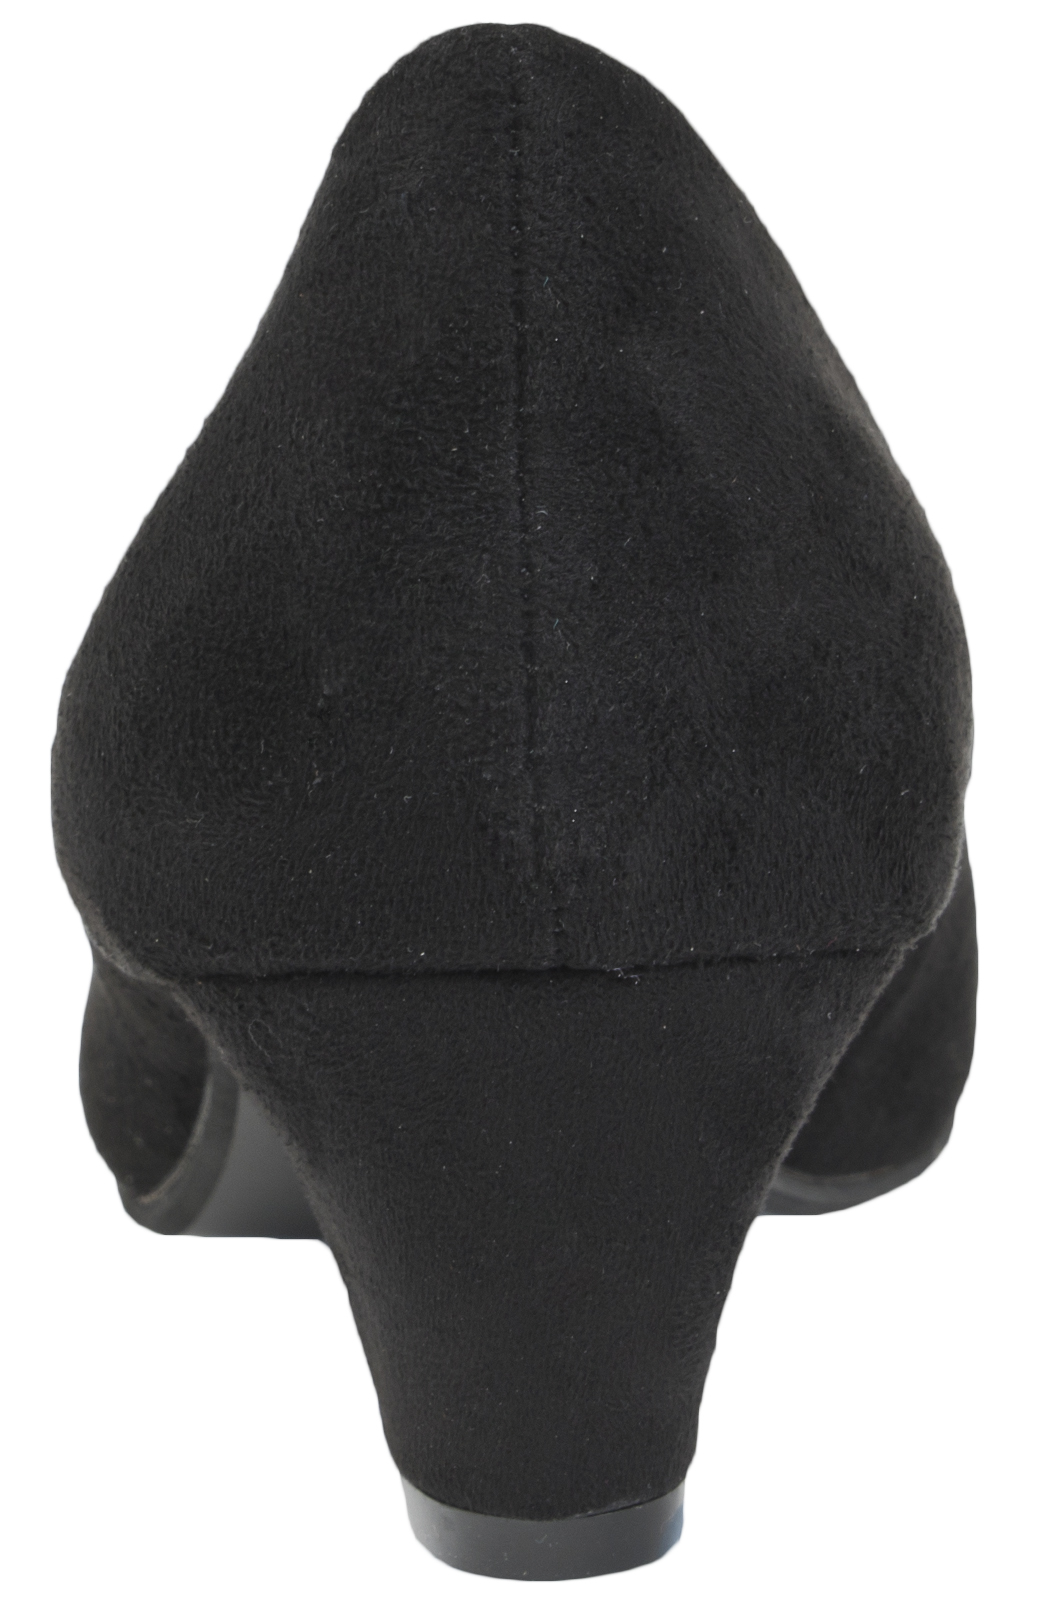 Ladies-Leather-Lined-Low-Block-Heels-Comfort-Work-Office-Court-Shoes-Ladies-Size miniatuur 3